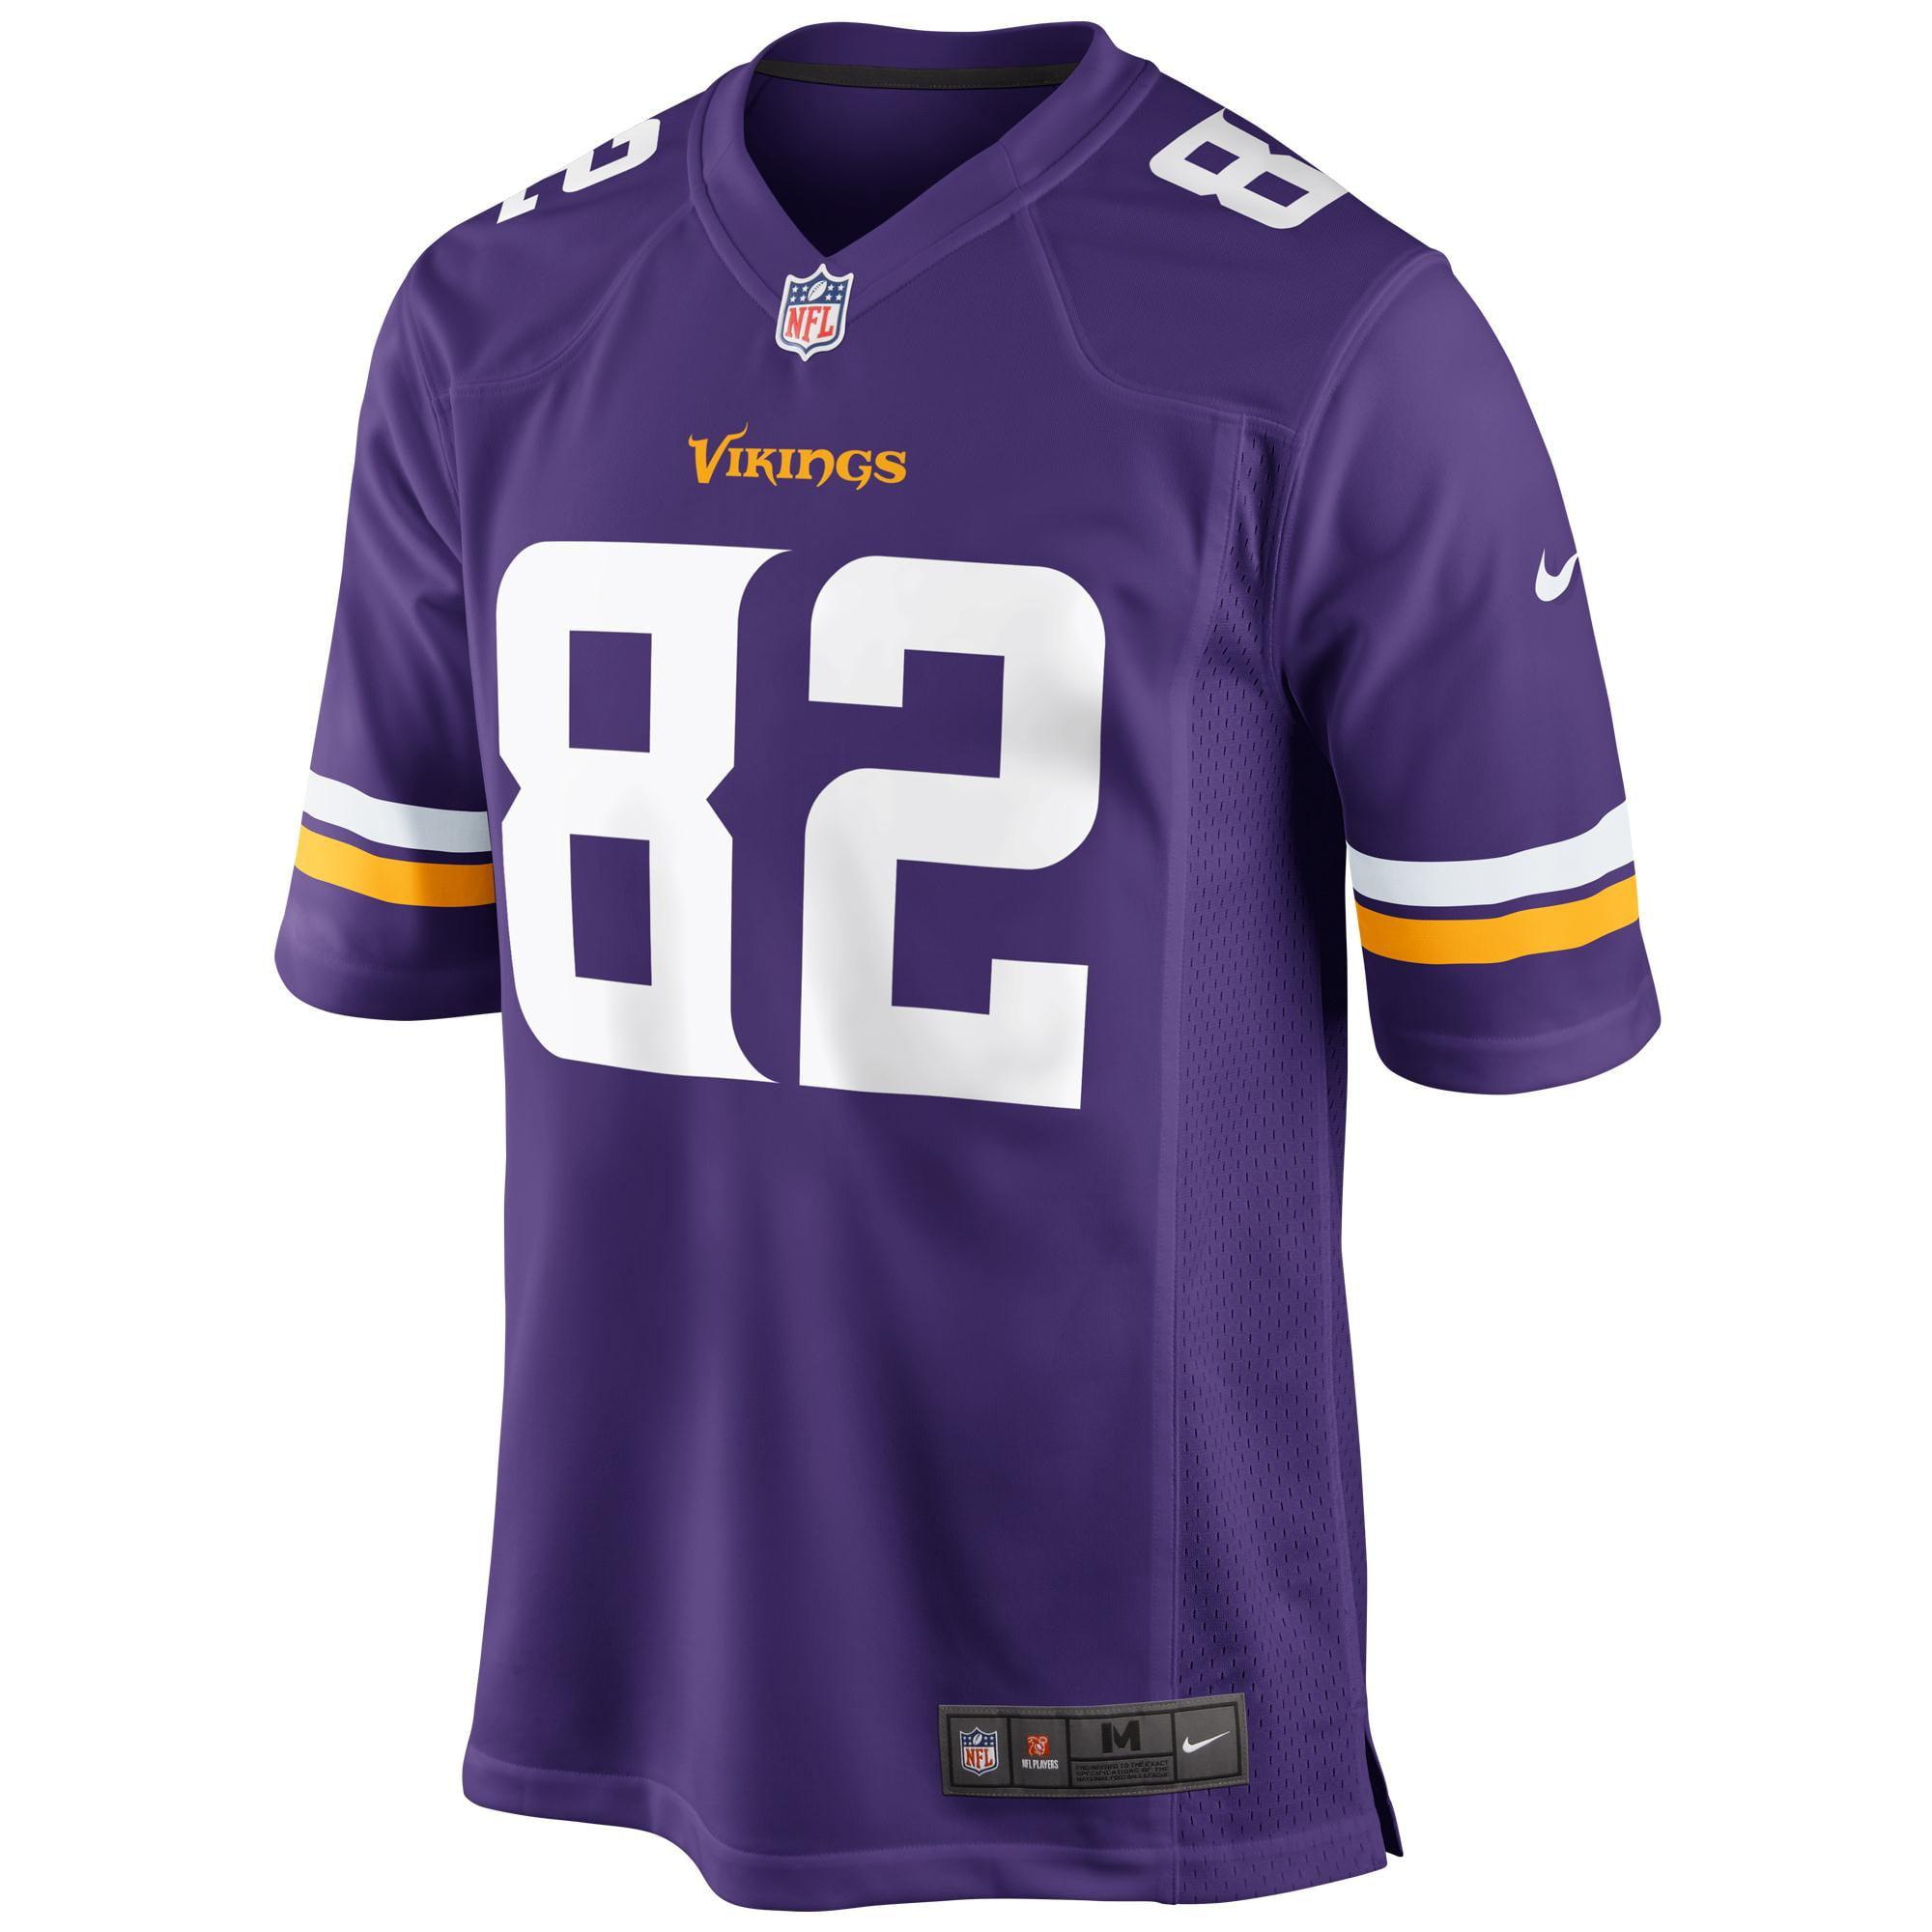 Kyle Rudolph Minnesota Vikings Nike Youth Team Color Game Jersey - Purple